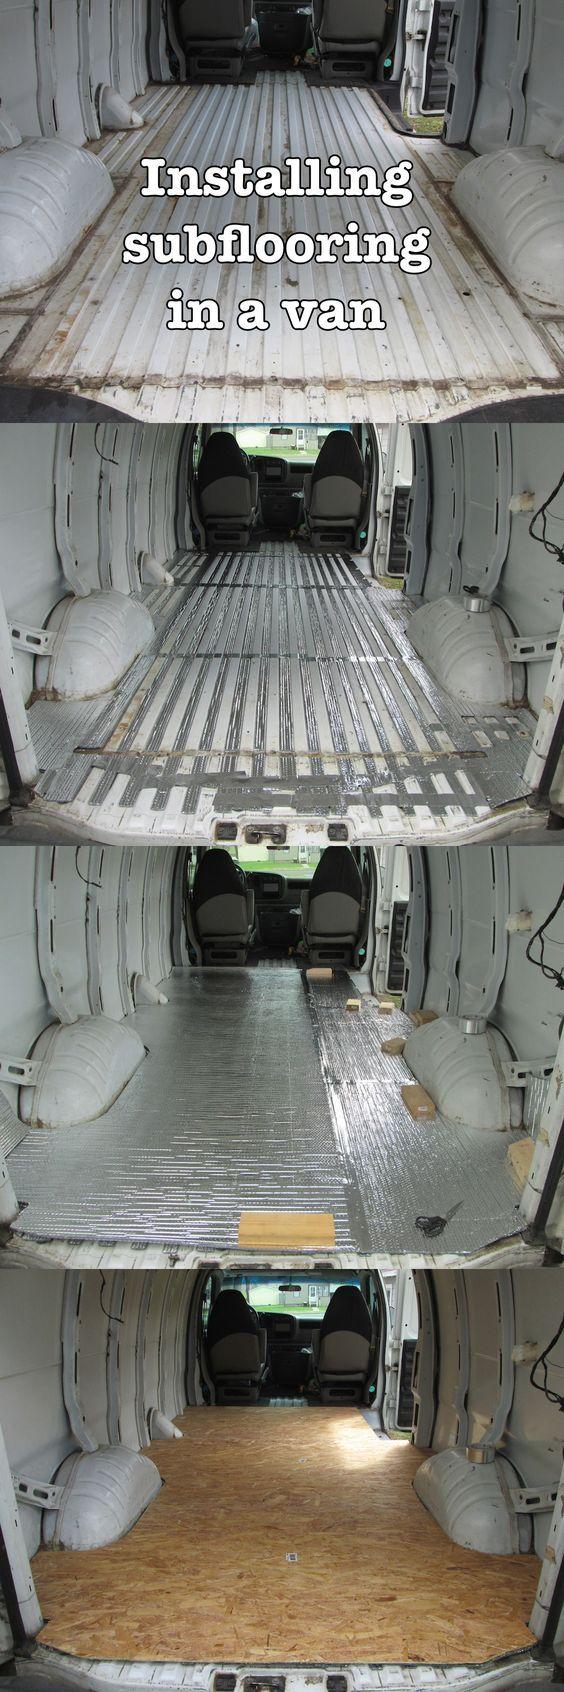 Installing a subfloor in a camper van:                              …